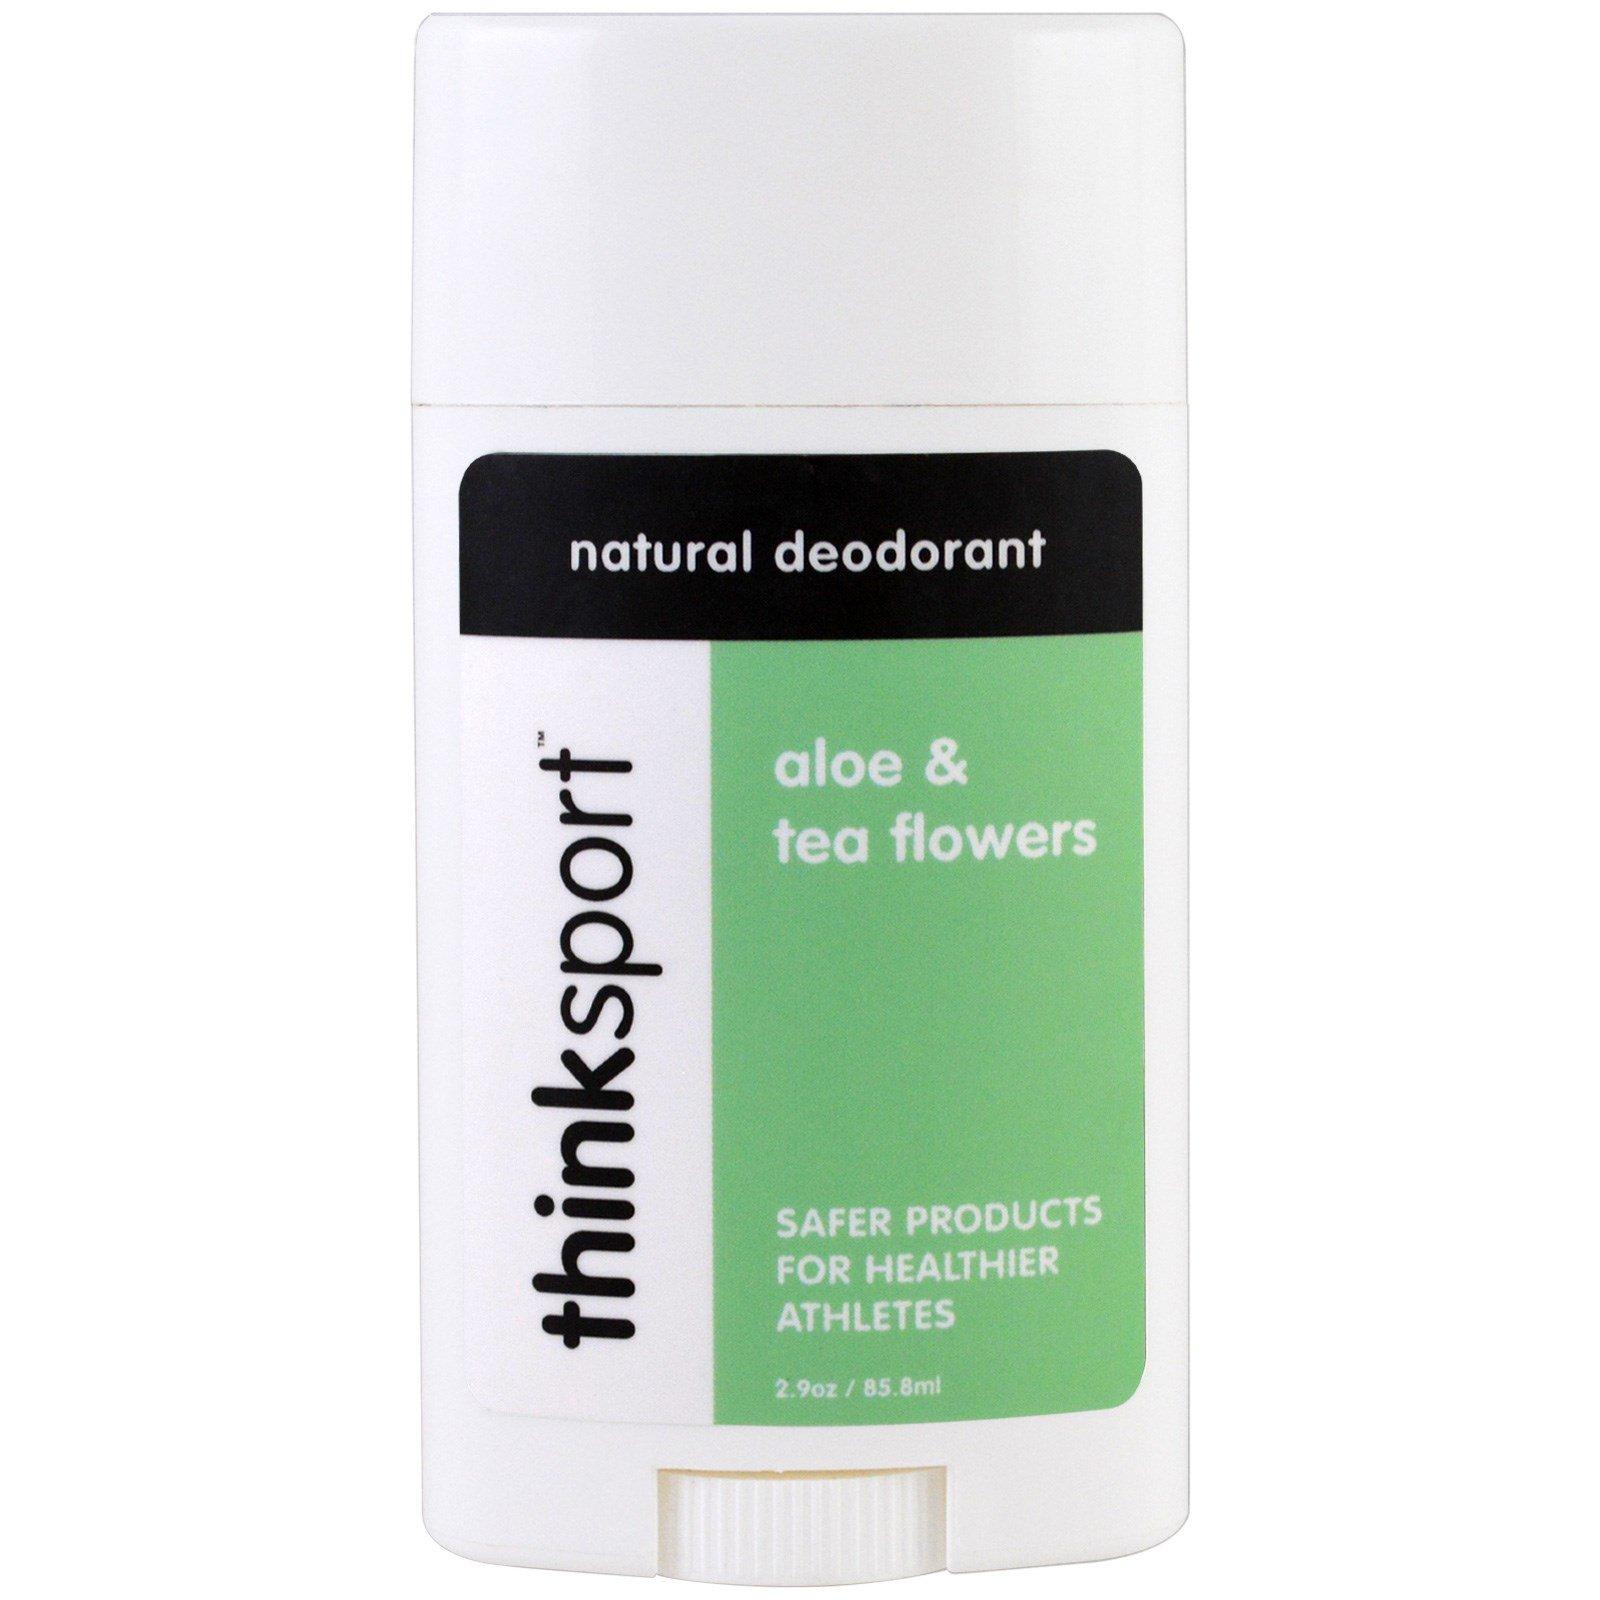 Think, Thinksport, натуральный дезодорант, алоэ и цветок чая, 2,9 унц. (85,8 мл)